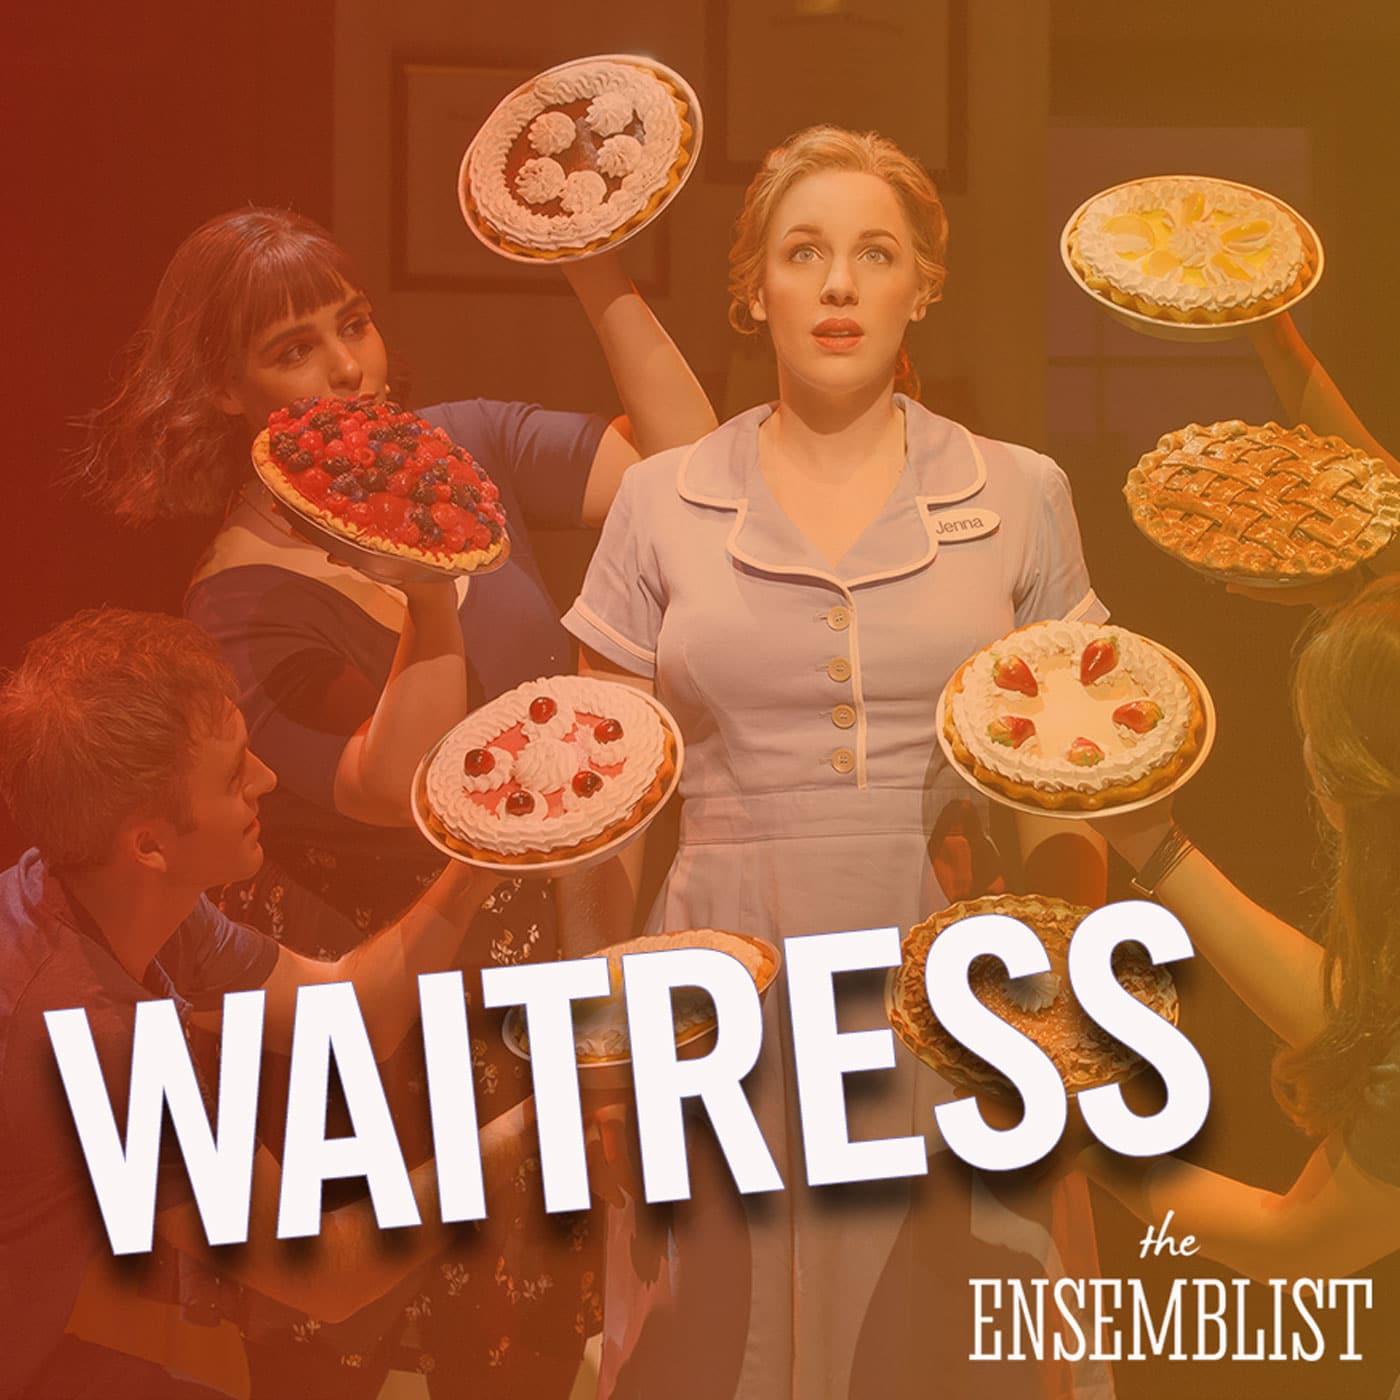 The Ensemblist Episode 219 Waitress Shoshana Bean, Molly Hager, Todrick Hall and Jessie Hooker-Bailey